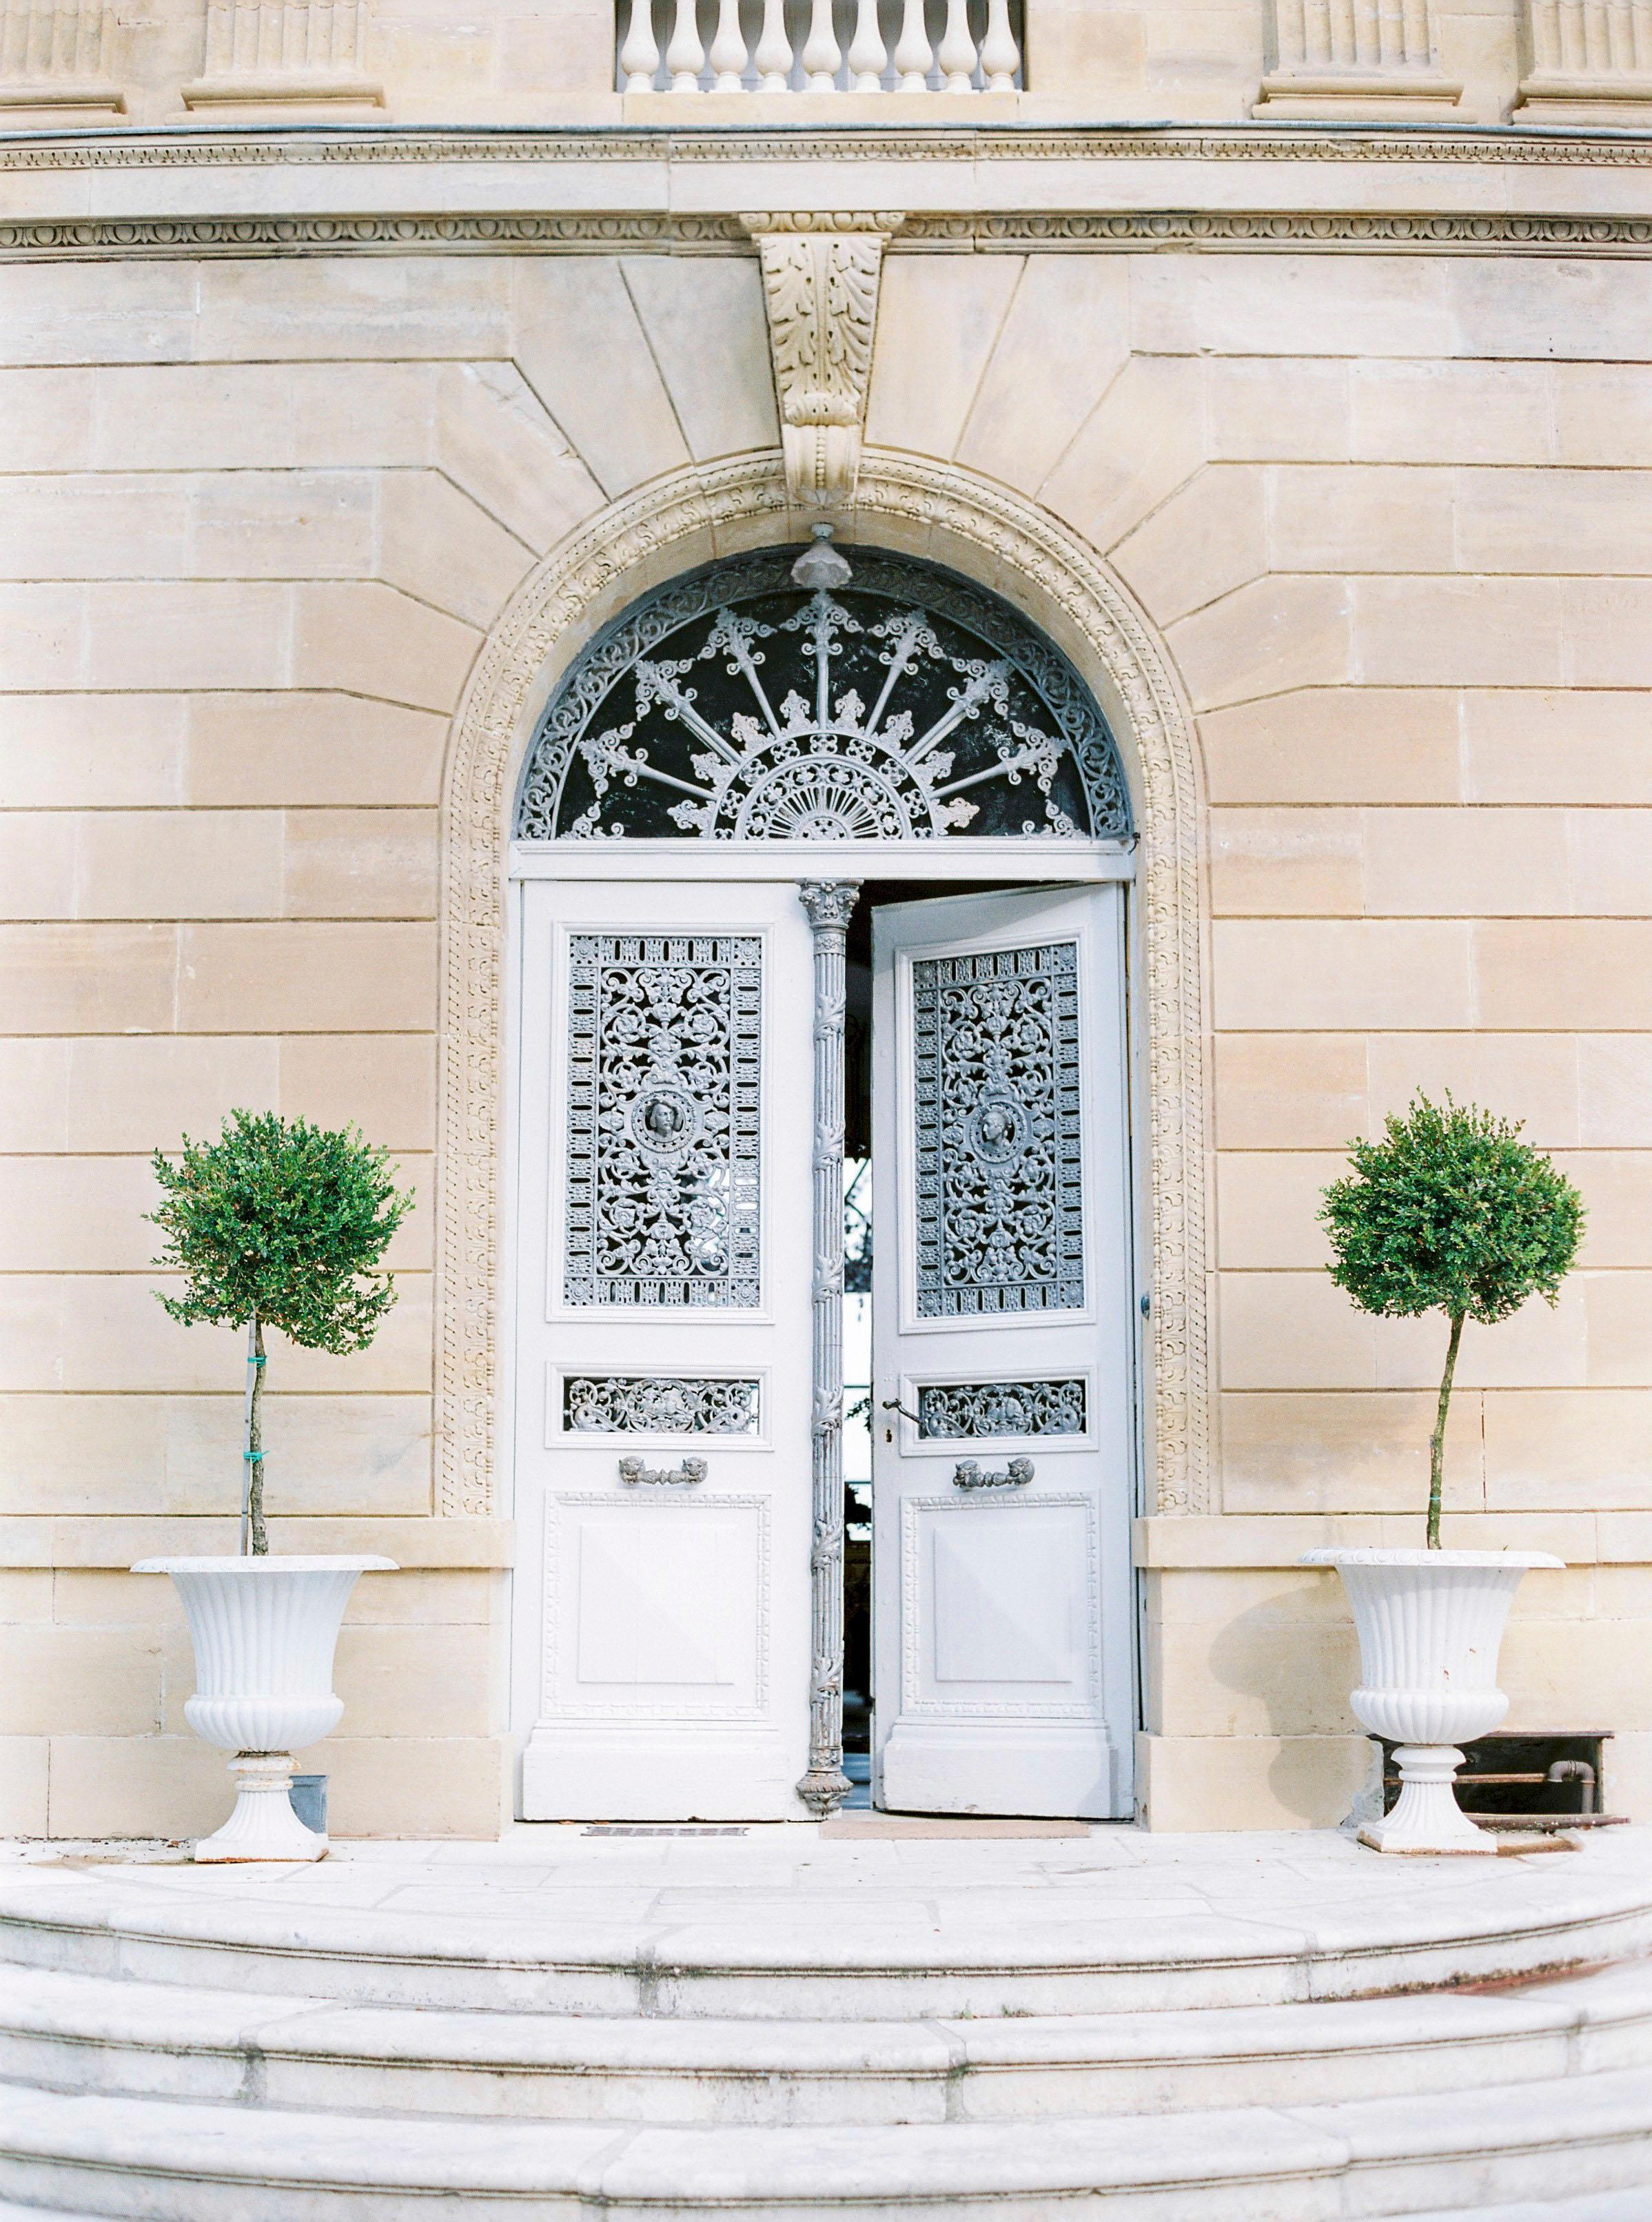 Chateau Entrance - 21st Century Contemporary Color Photograph by Pia Clodi